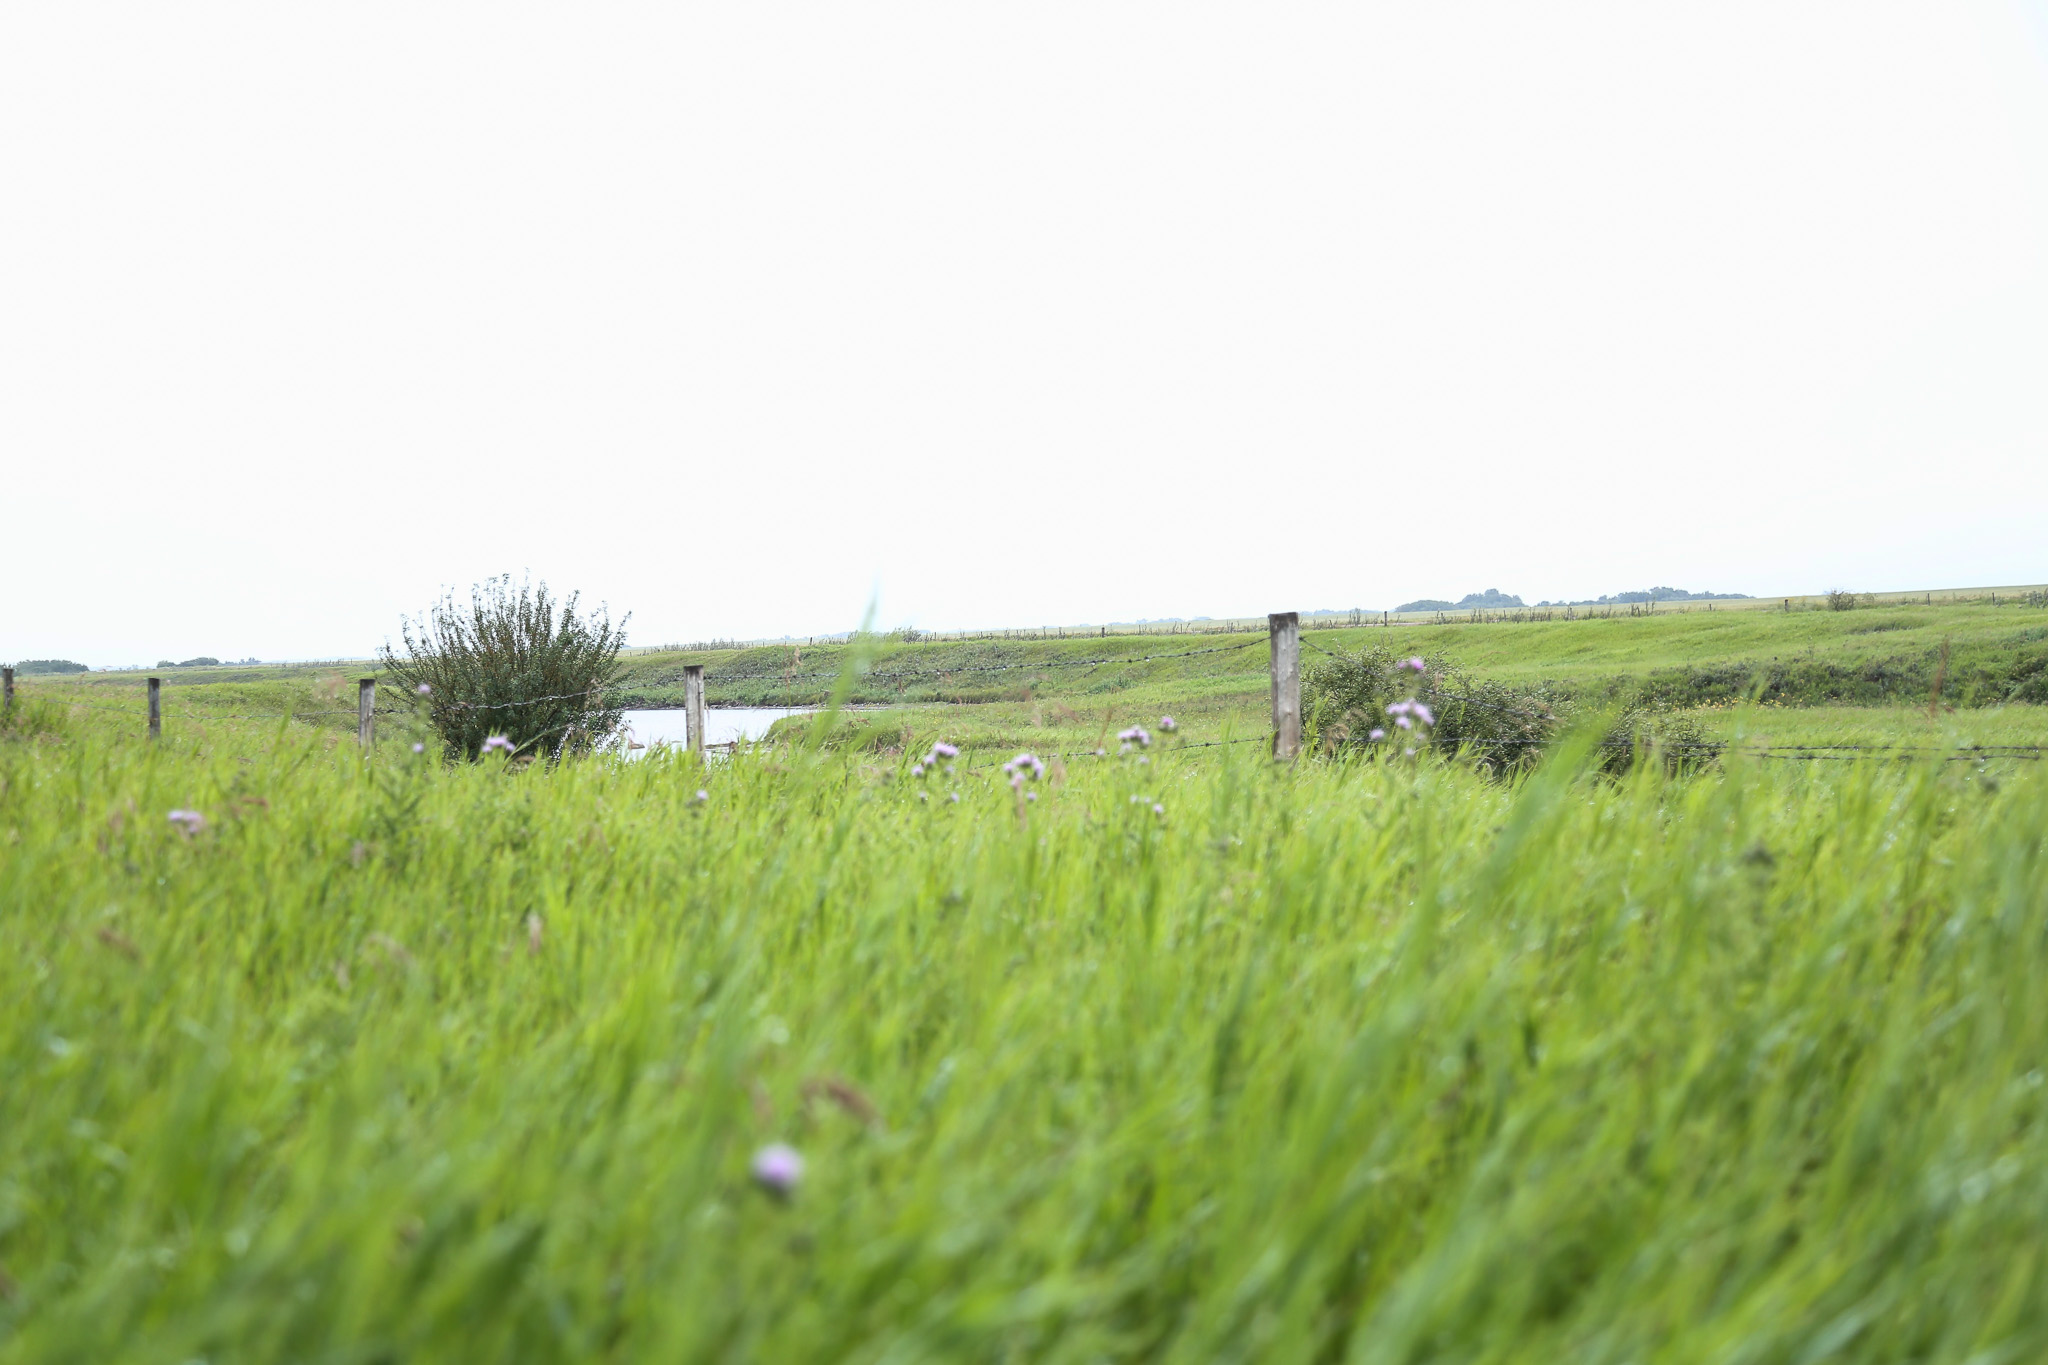 Green grassy prairies in July